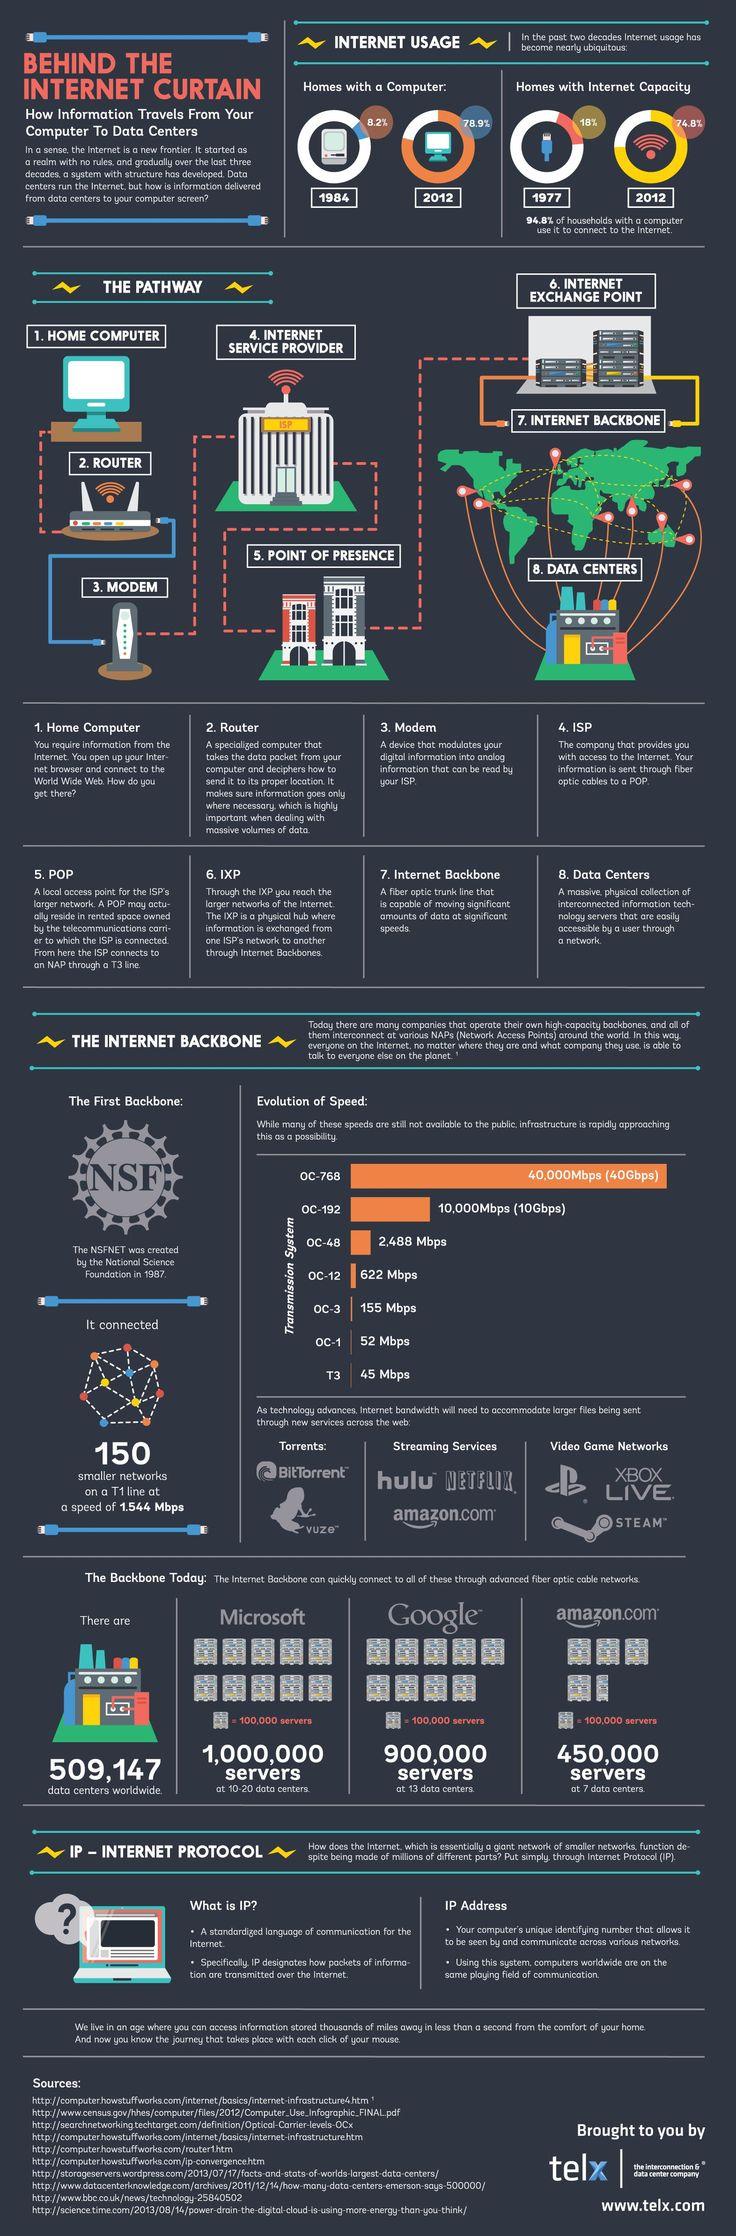 How your Data Reaches the Data Center - http://www.aivanet.com/2014/03/data-reaches-data-center/ #BitCoinAnswersandInfo